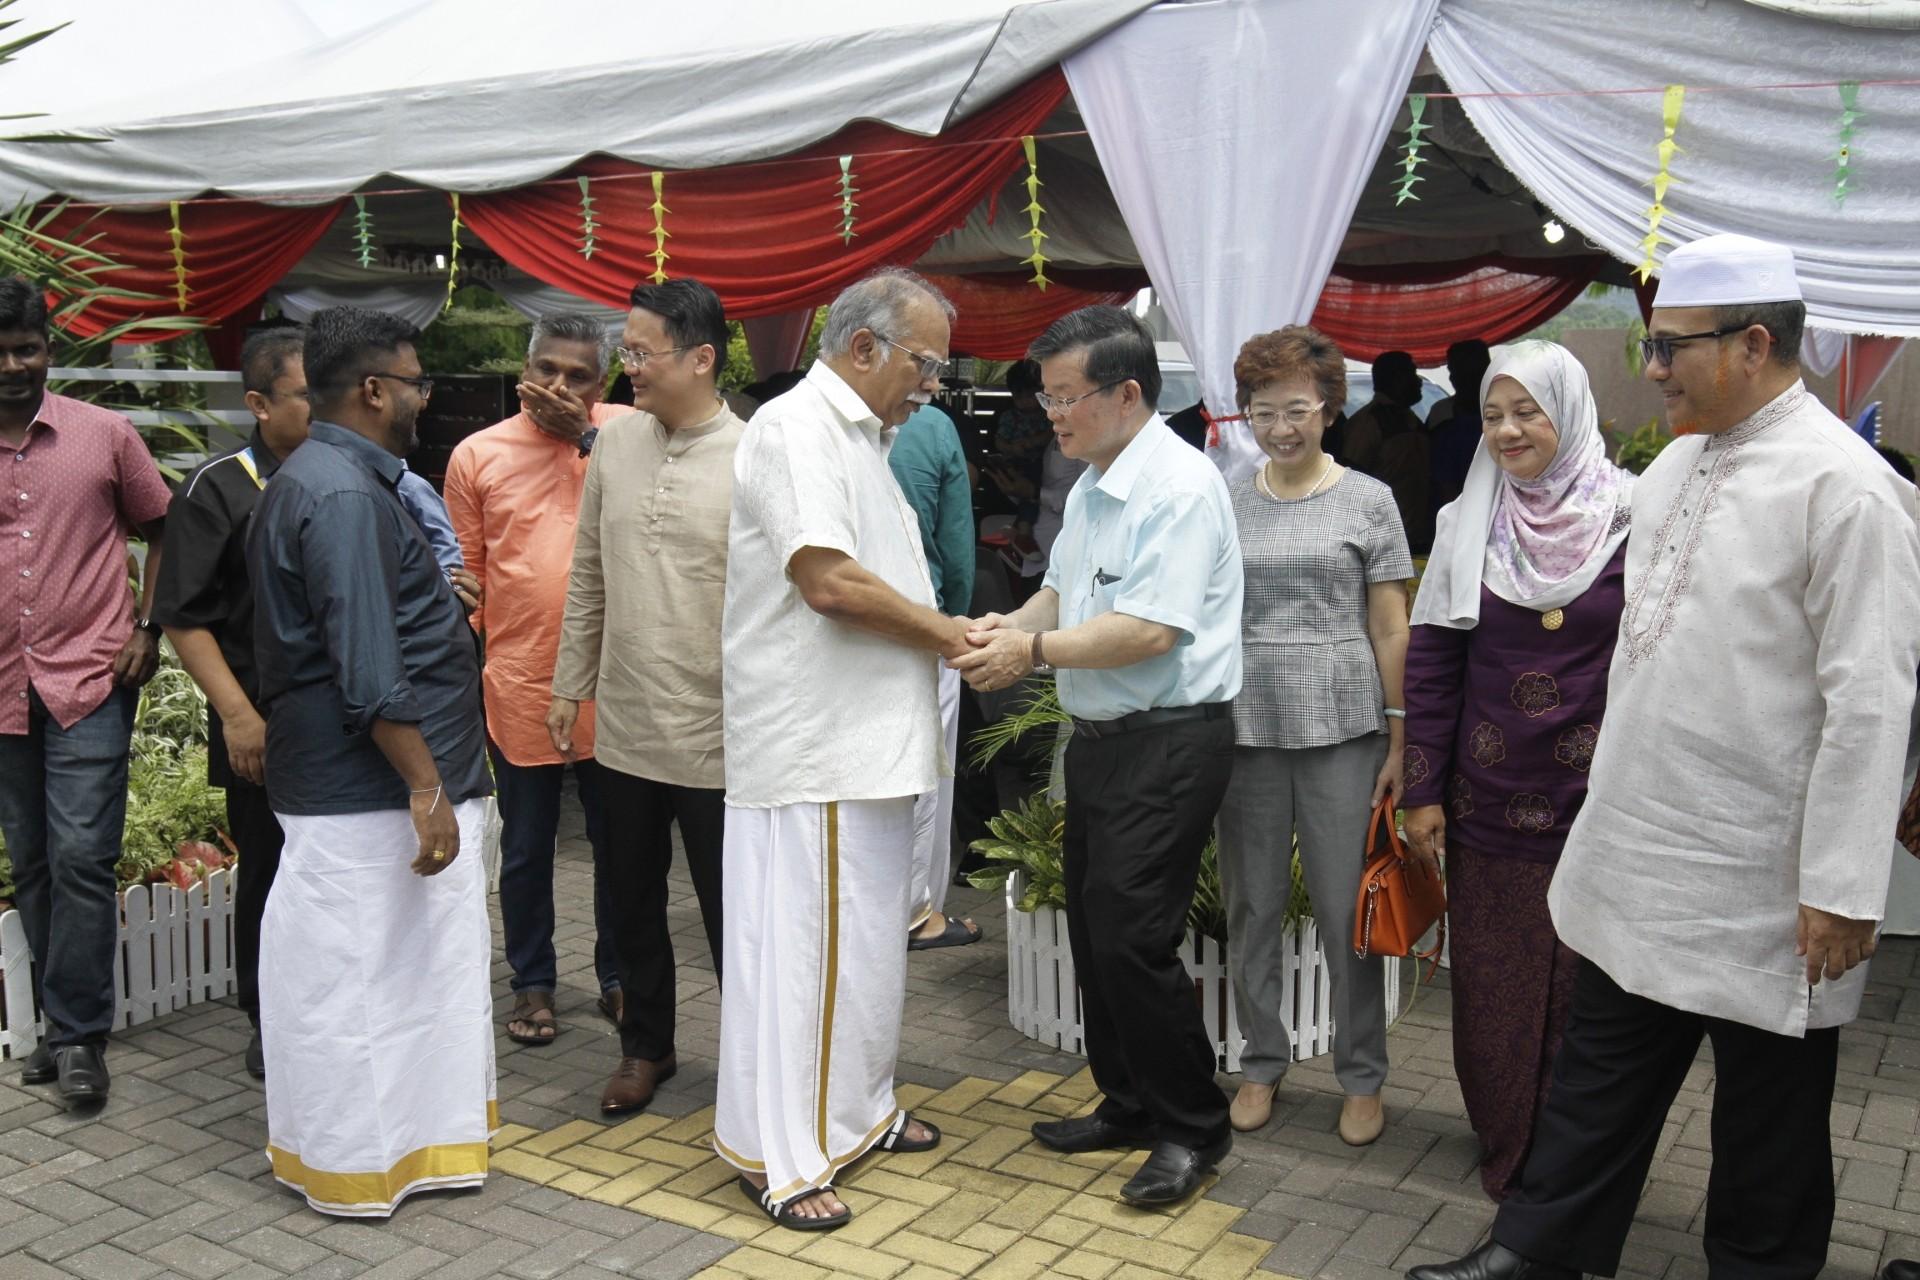 Ramasamy (white dothi) greeting Chow at his Deepavali open house at Bandar Tasek Mutiara in Simpang Empat, Penang. —Photos: CHAN BOON KAI/The Star